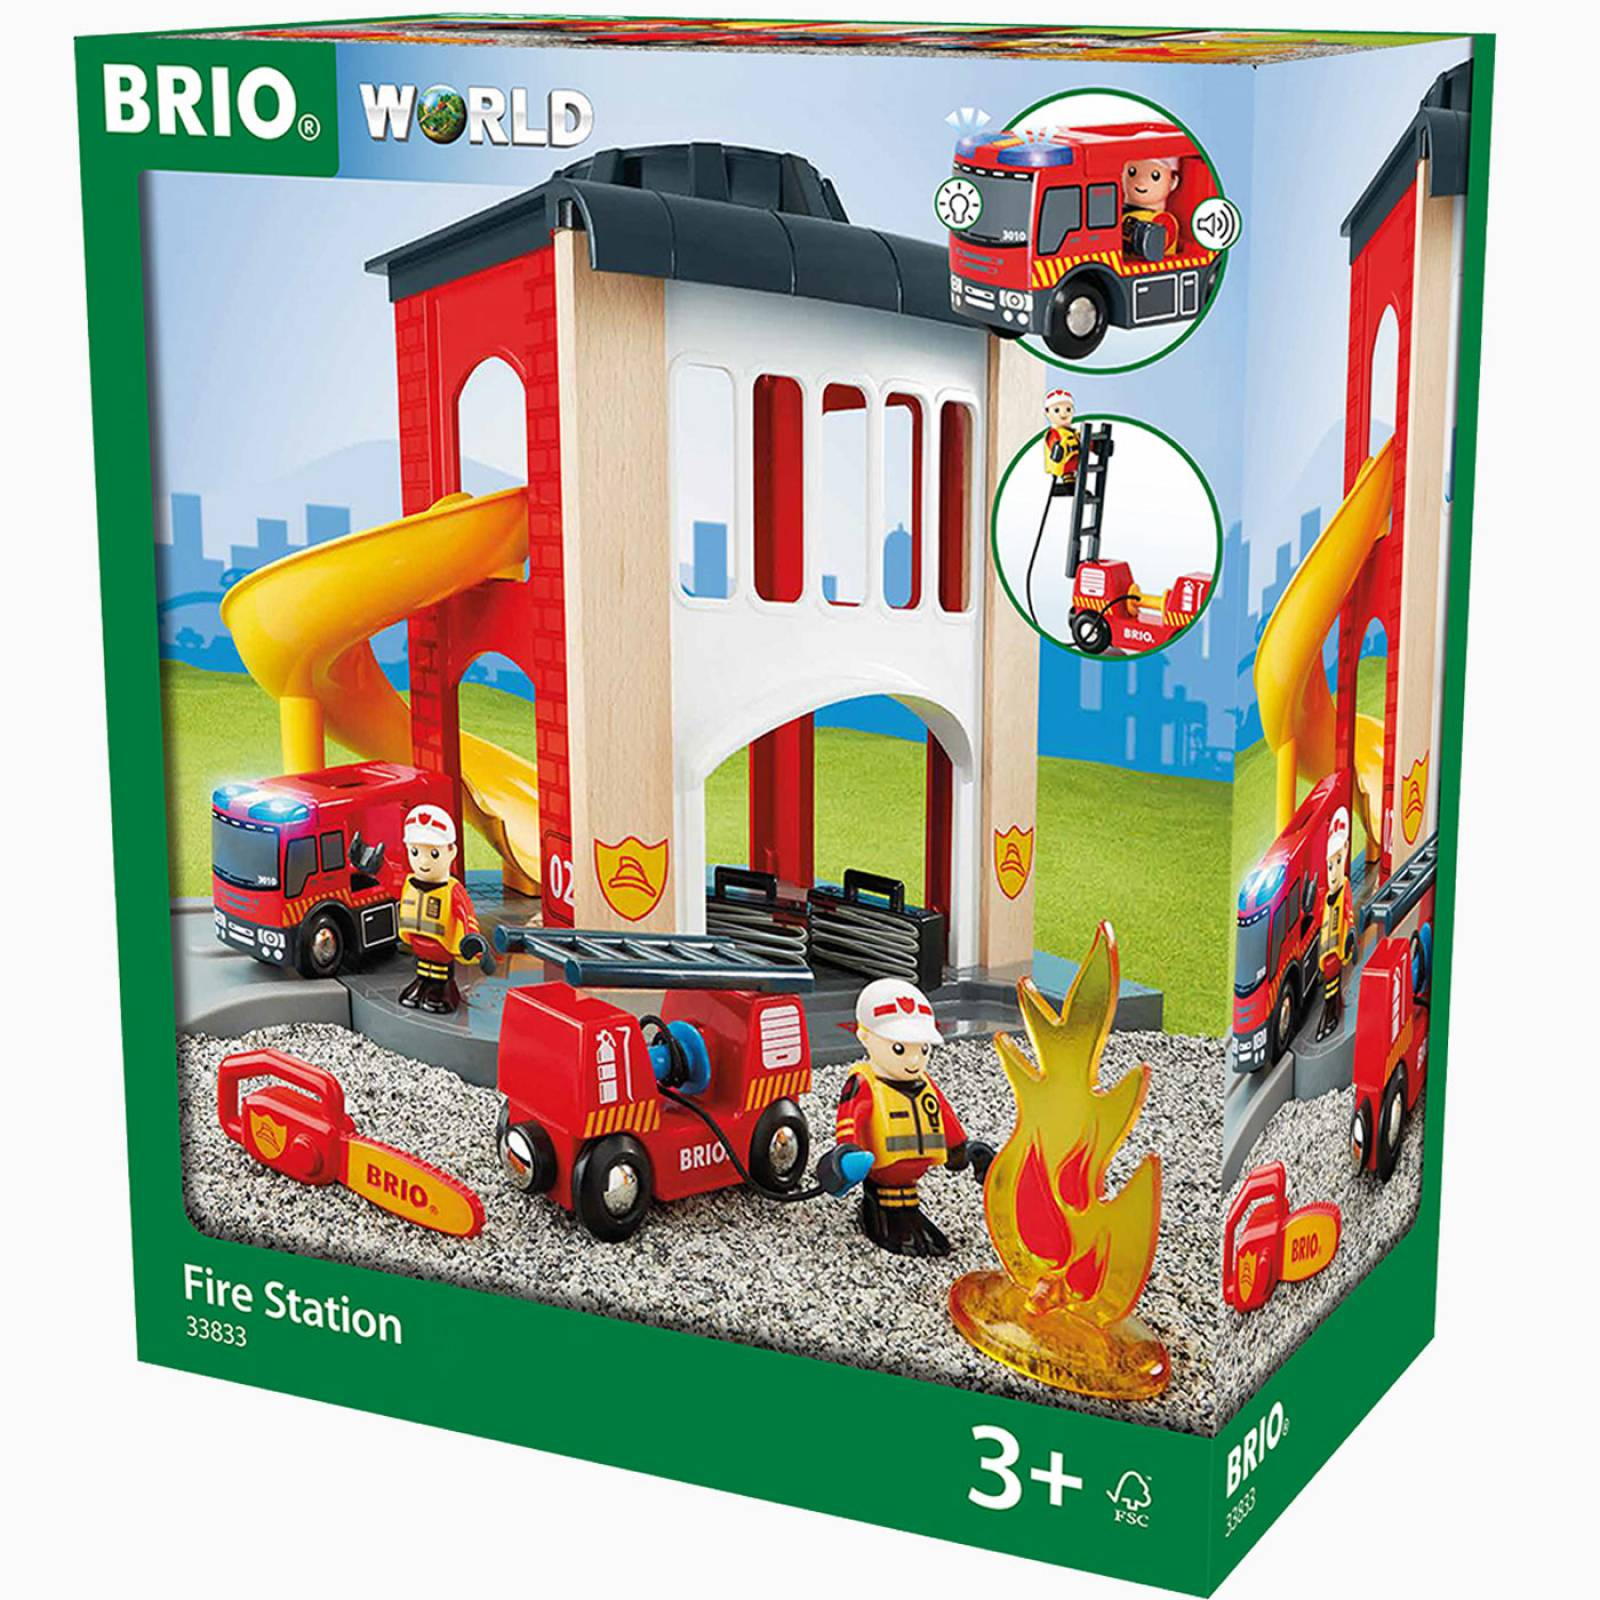 Fire Station BRIO® Wooden Railway Age 3+